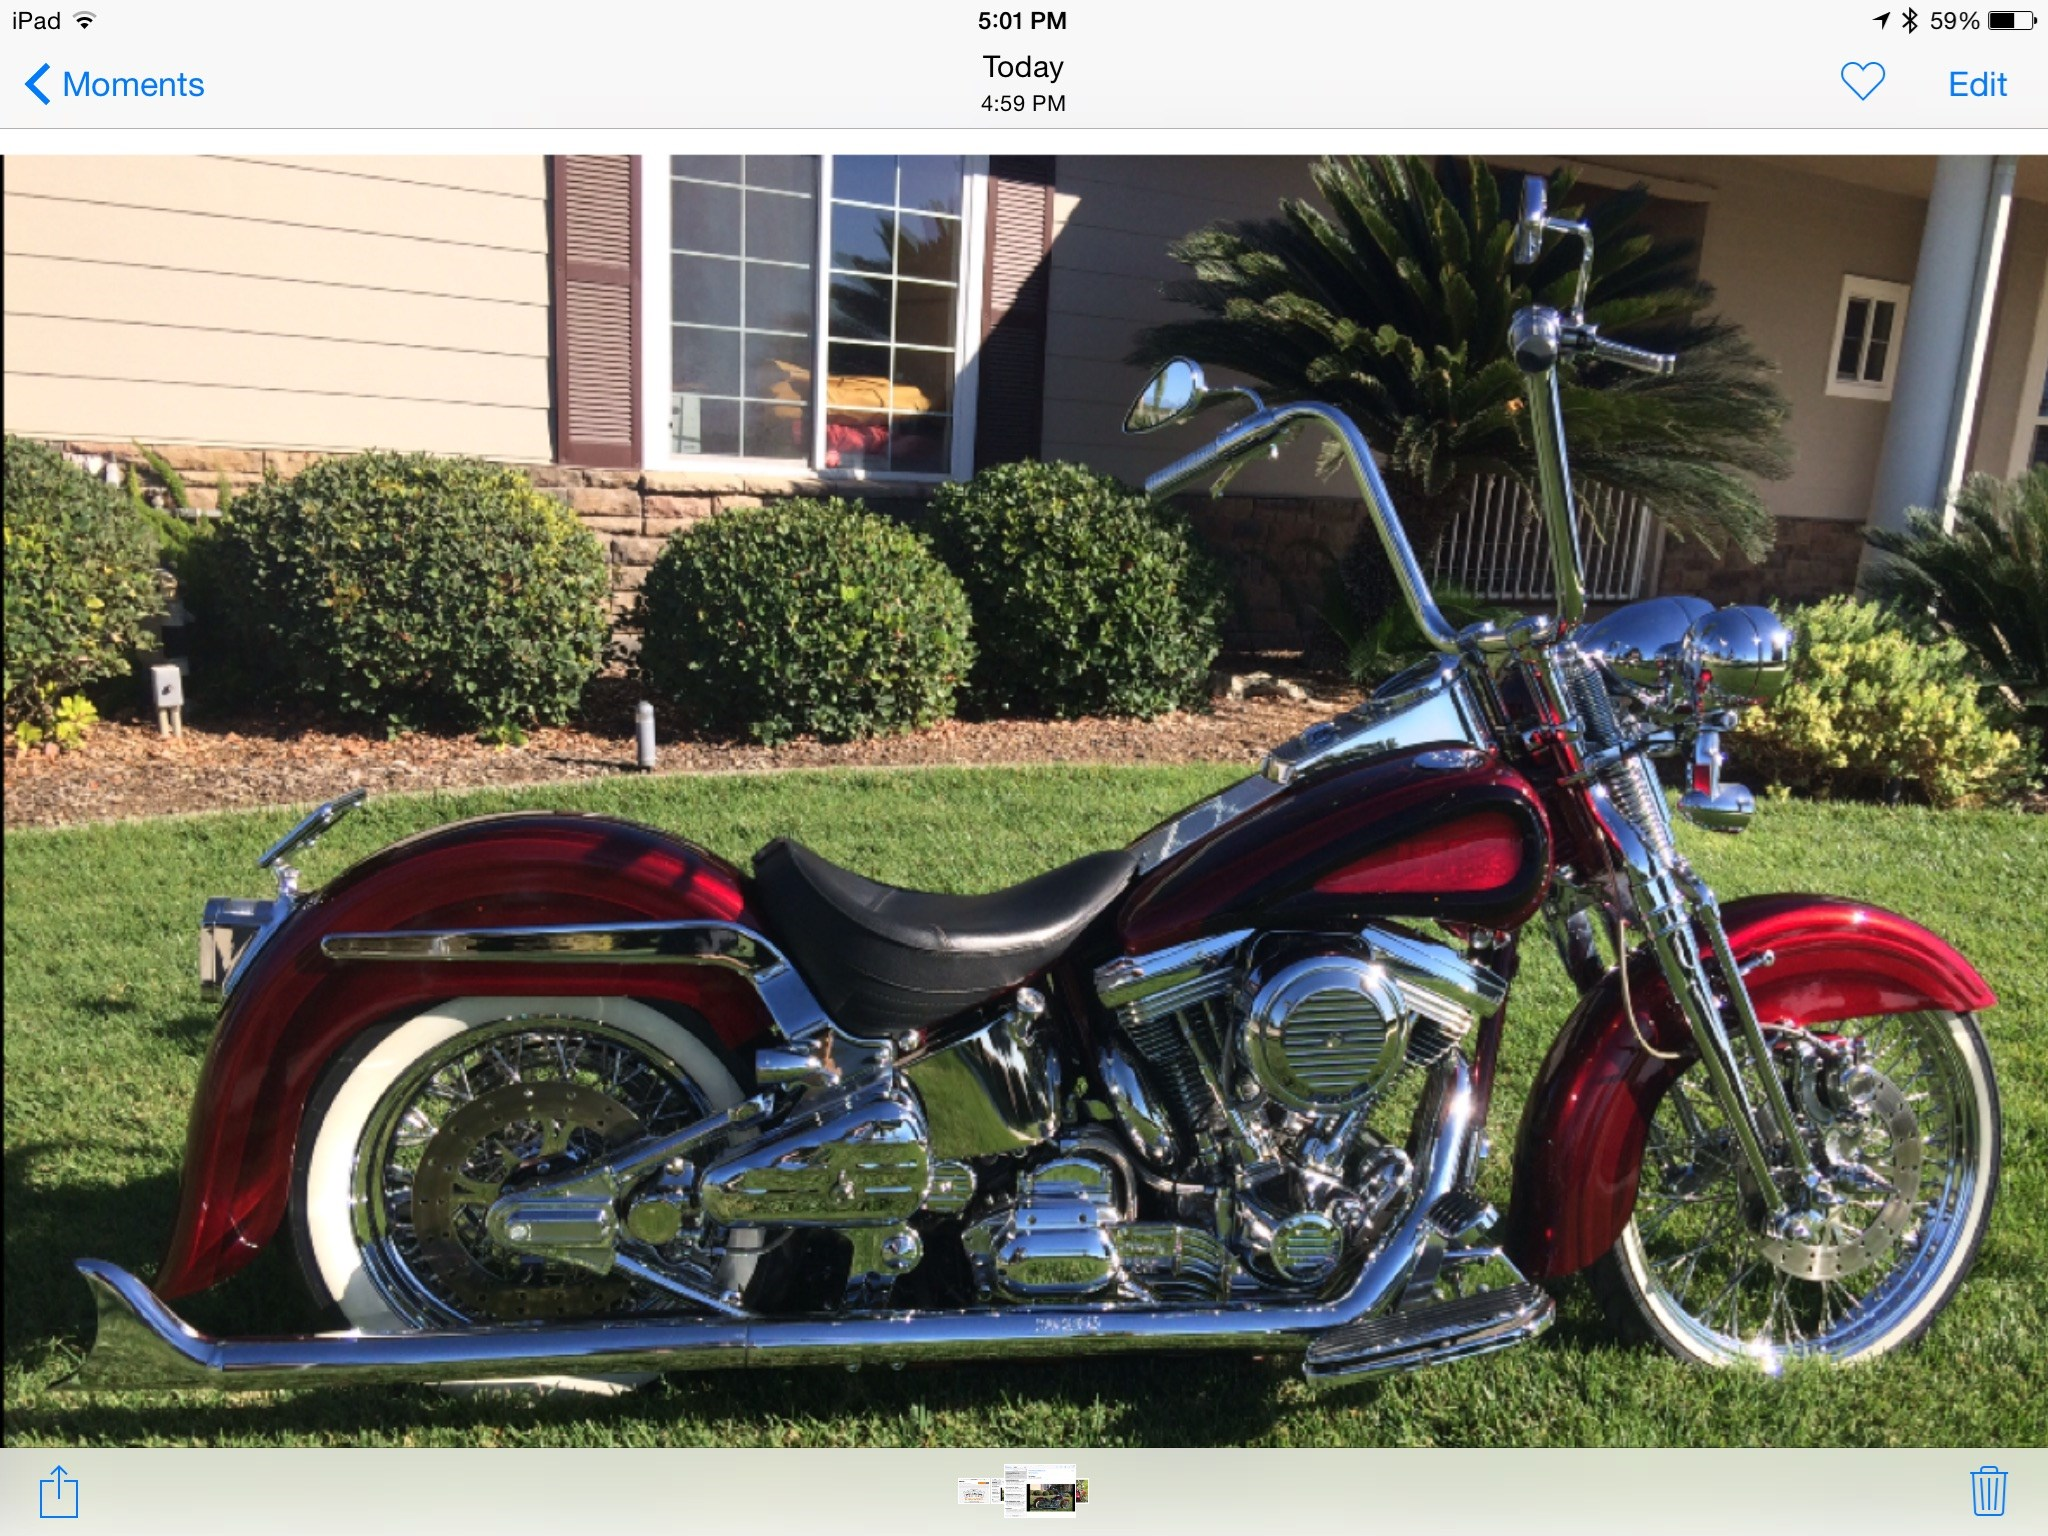 1999 Harley Davidson 174 Fxstc Softail 174 Custom Brandy Wine